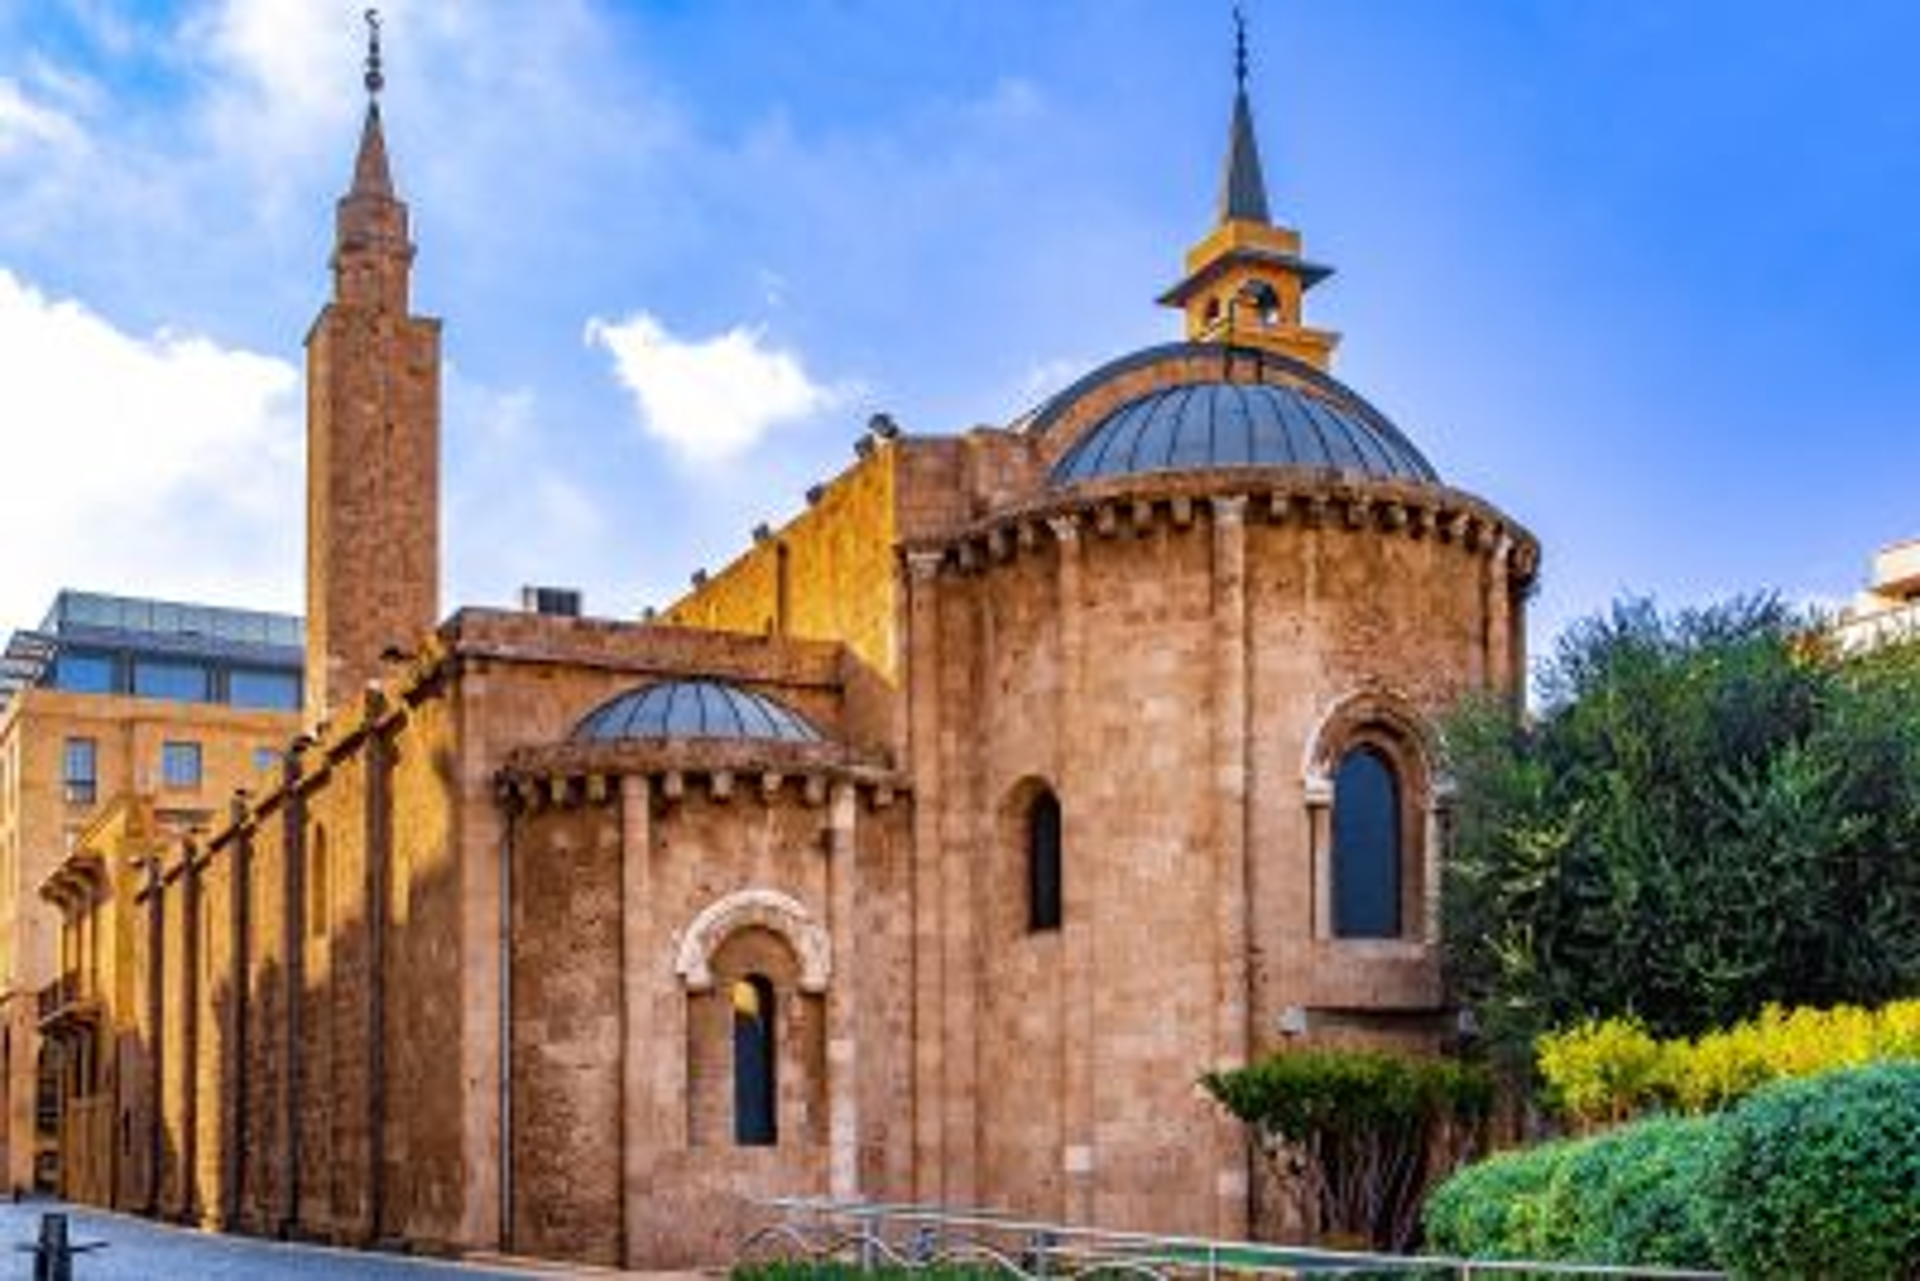 Selain Hagia Sophia, Masjid Bersejarah Ini Juga Pernah Dijadikan Gereja